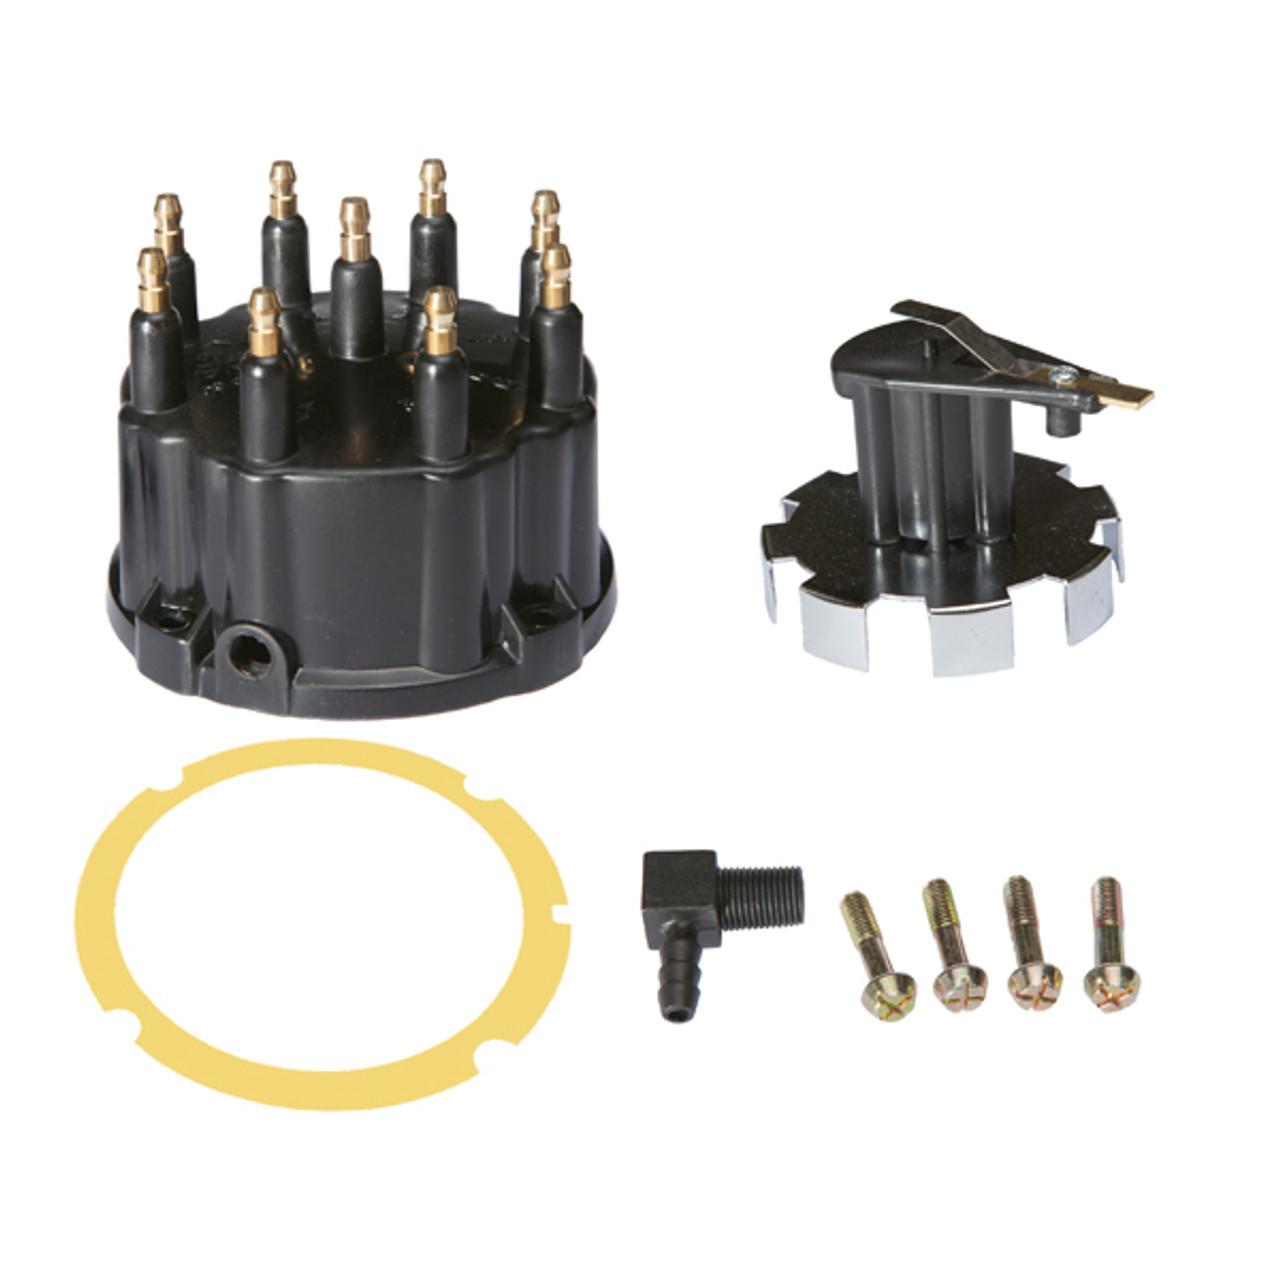 84-816761Q16 Thunderbolt IV Ignitions MerCruiser 4.3L Ingition Wire Set